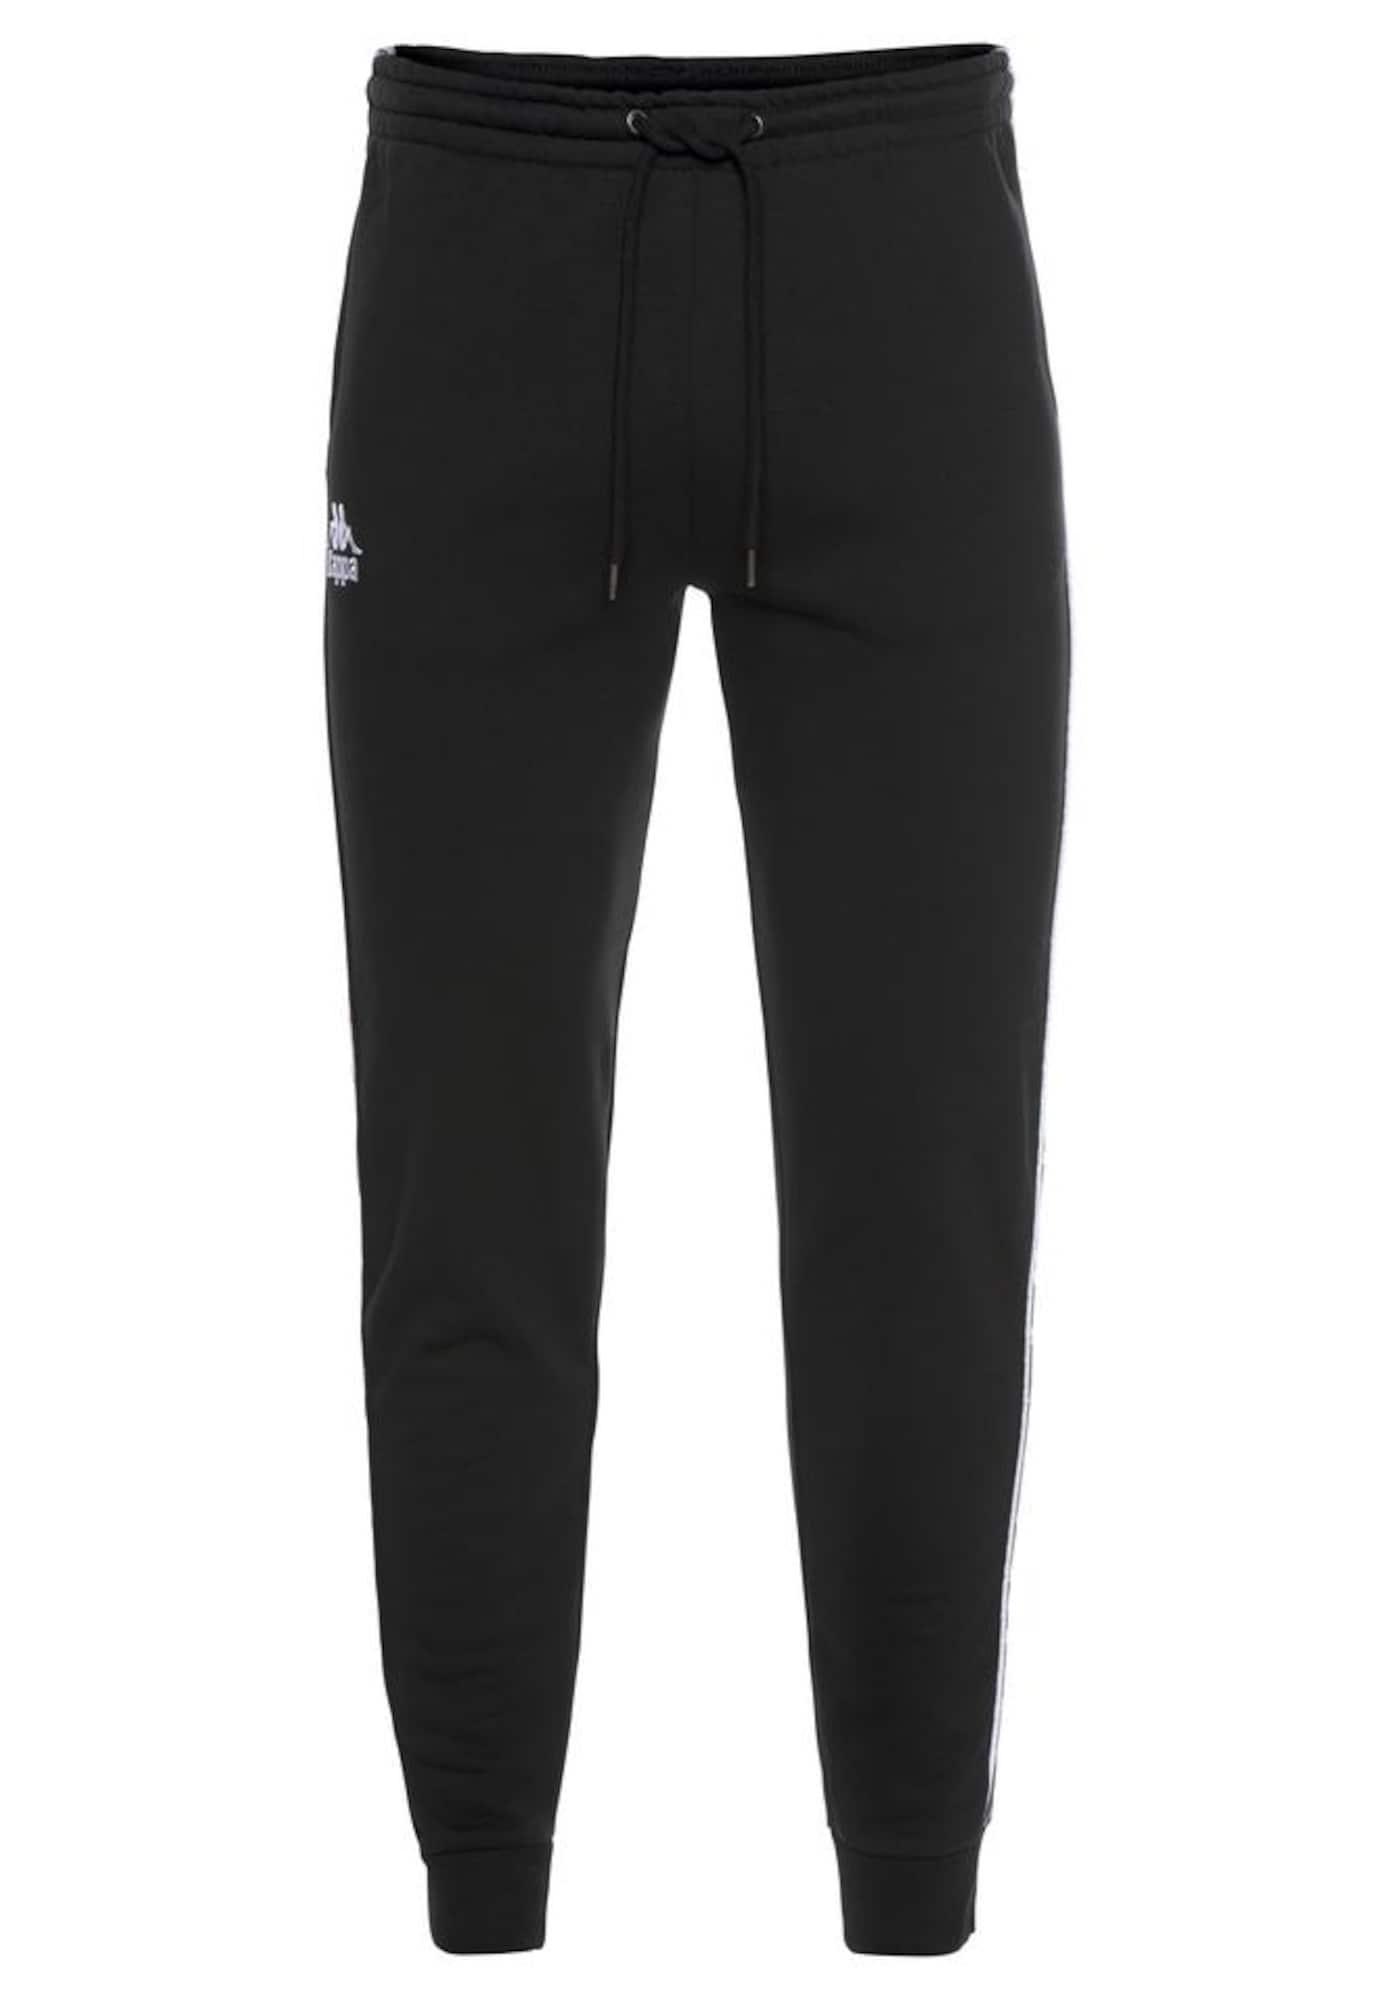 Jogginghose 'Eike'   Sportbekleidung > Sporthosen > Jogginghosen   Schwarz - Weiß   Kappa